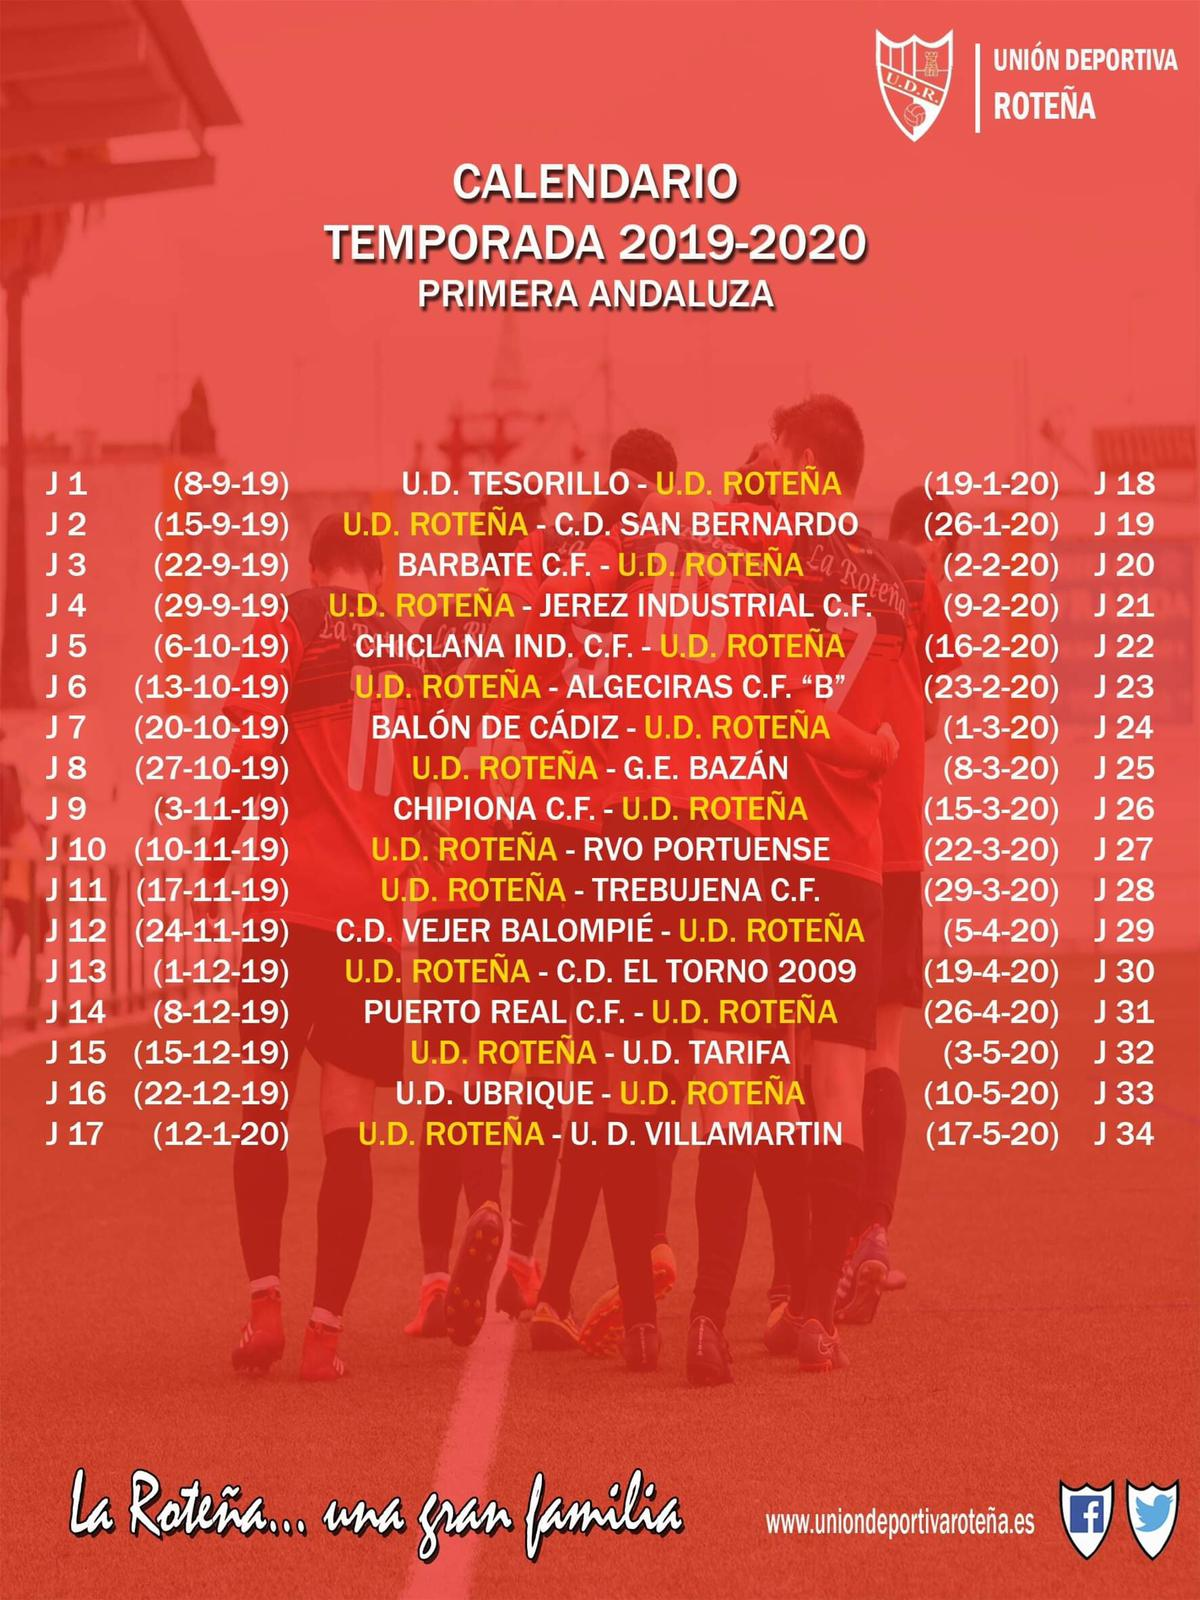 Calendario 2019/2020 Primera Andaluza